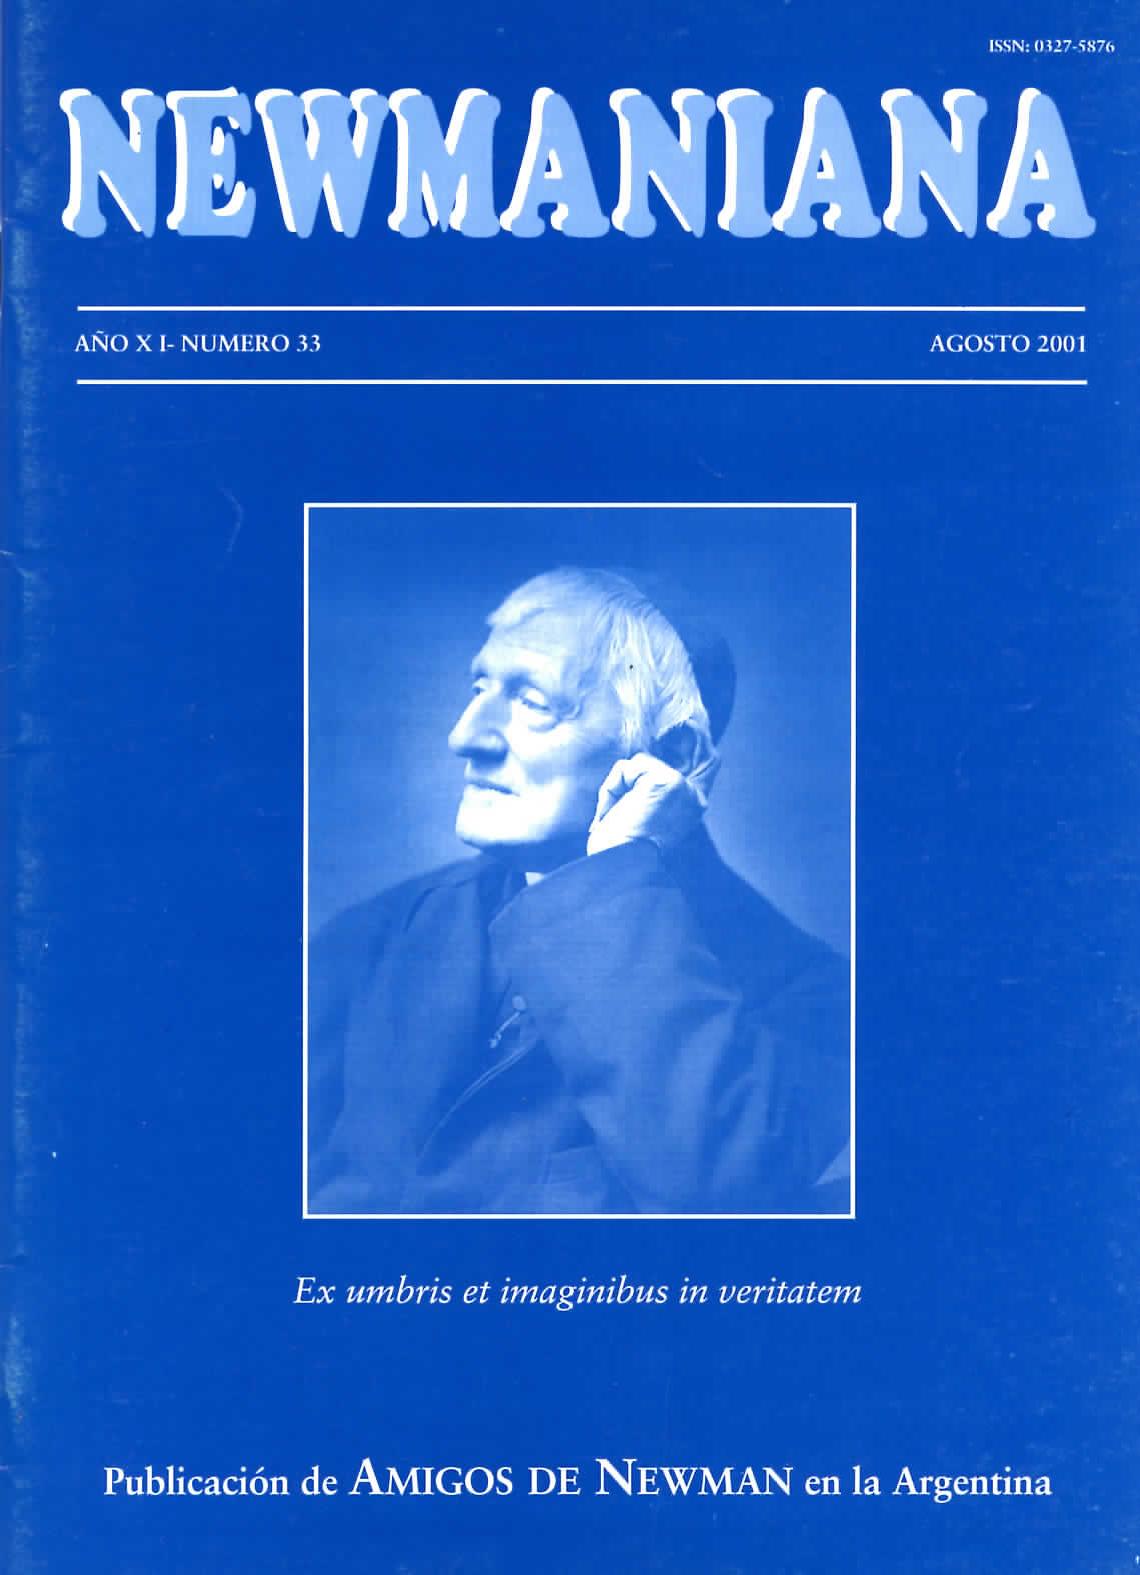 Revista Newmaniana N° 33 – Agosto 2001